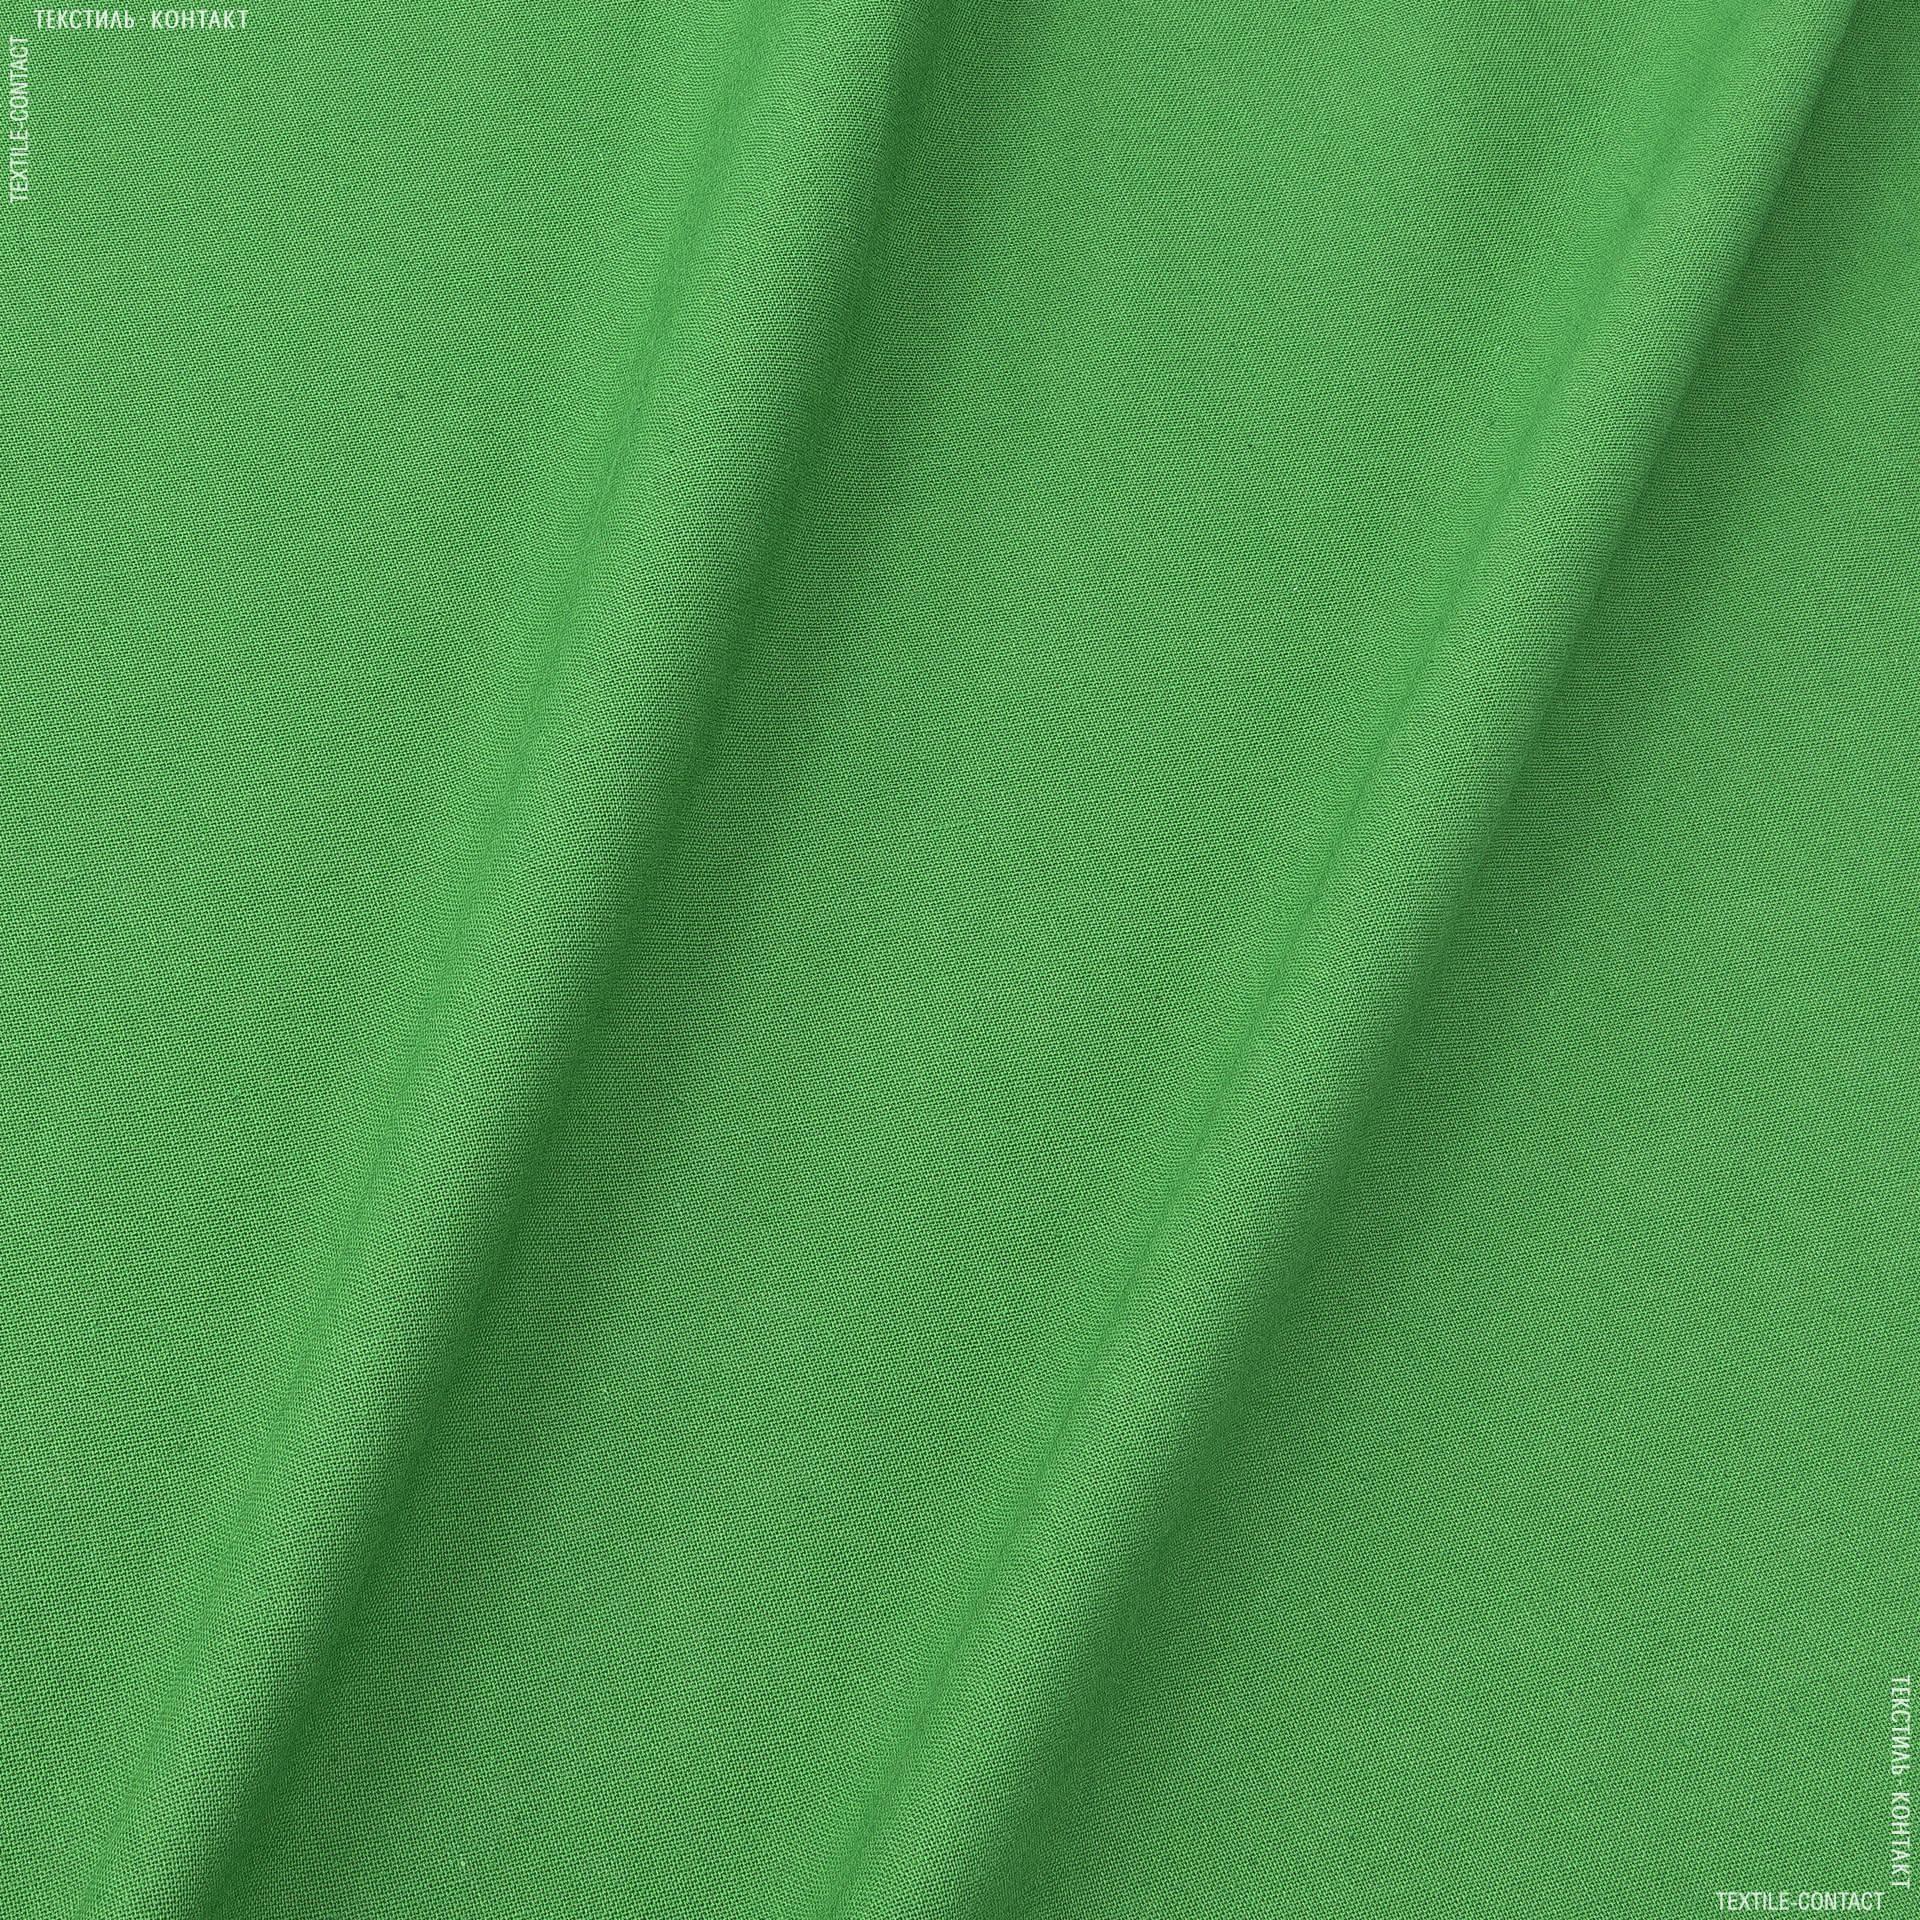 Ткани для брюк - Лен гранд зеленый